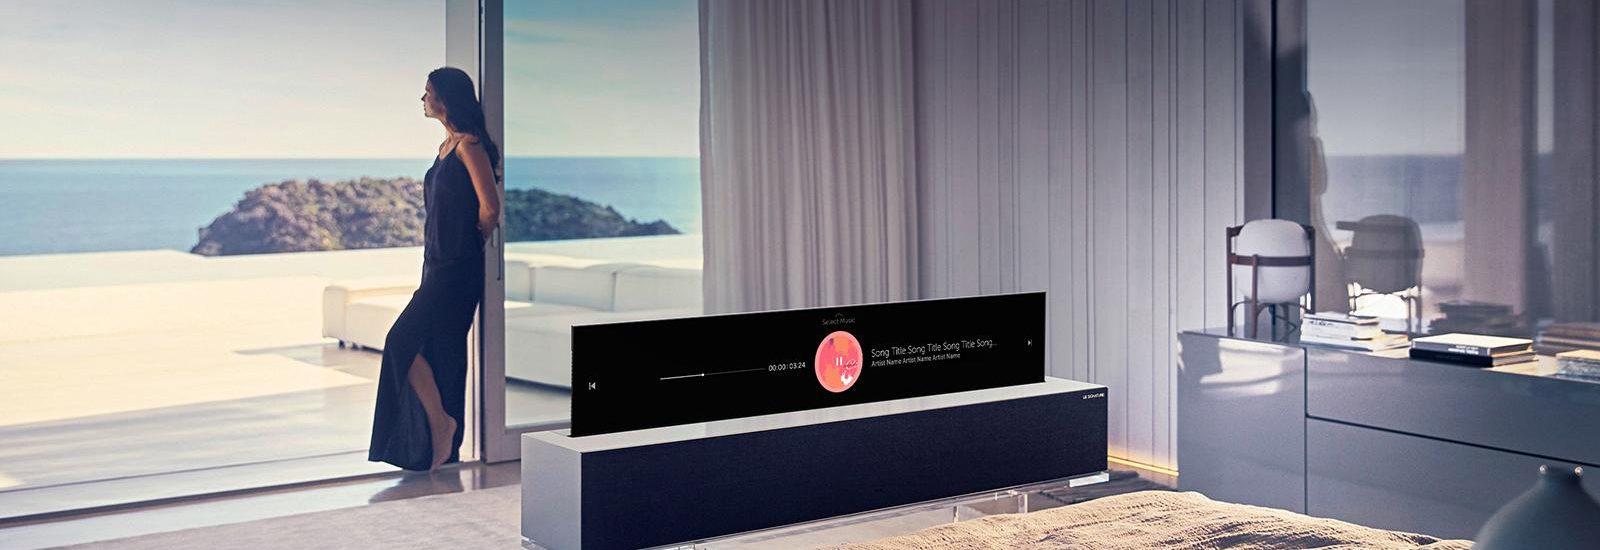 LG-TV-tech-home-lady-sea-view-banner